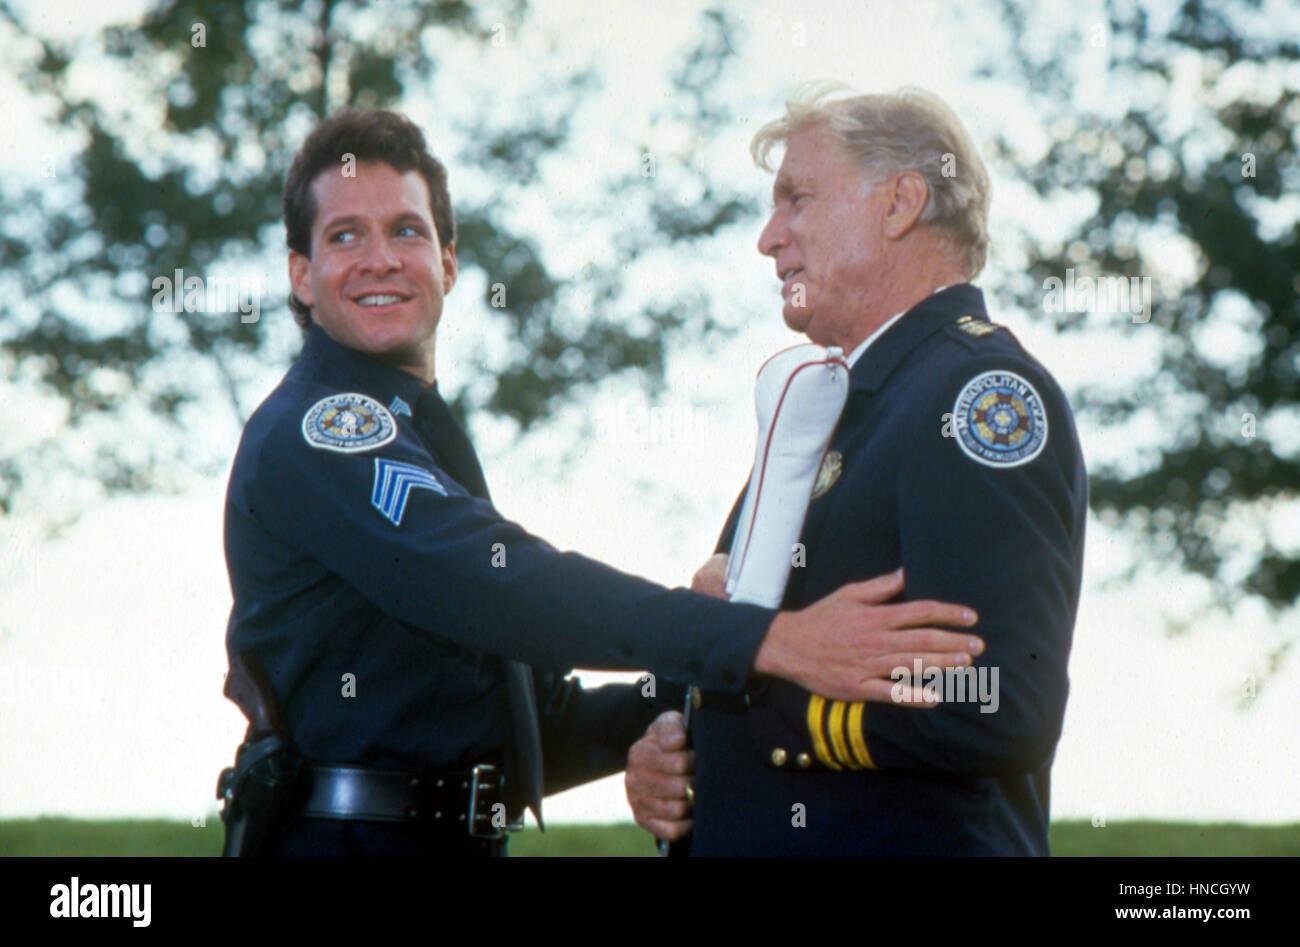 1. Januar 1987 -... Police Academy 4: Bürger auf Patrouille, Steve Guttenberg, George Gaynes... Film und Fernsehen. Stockbild